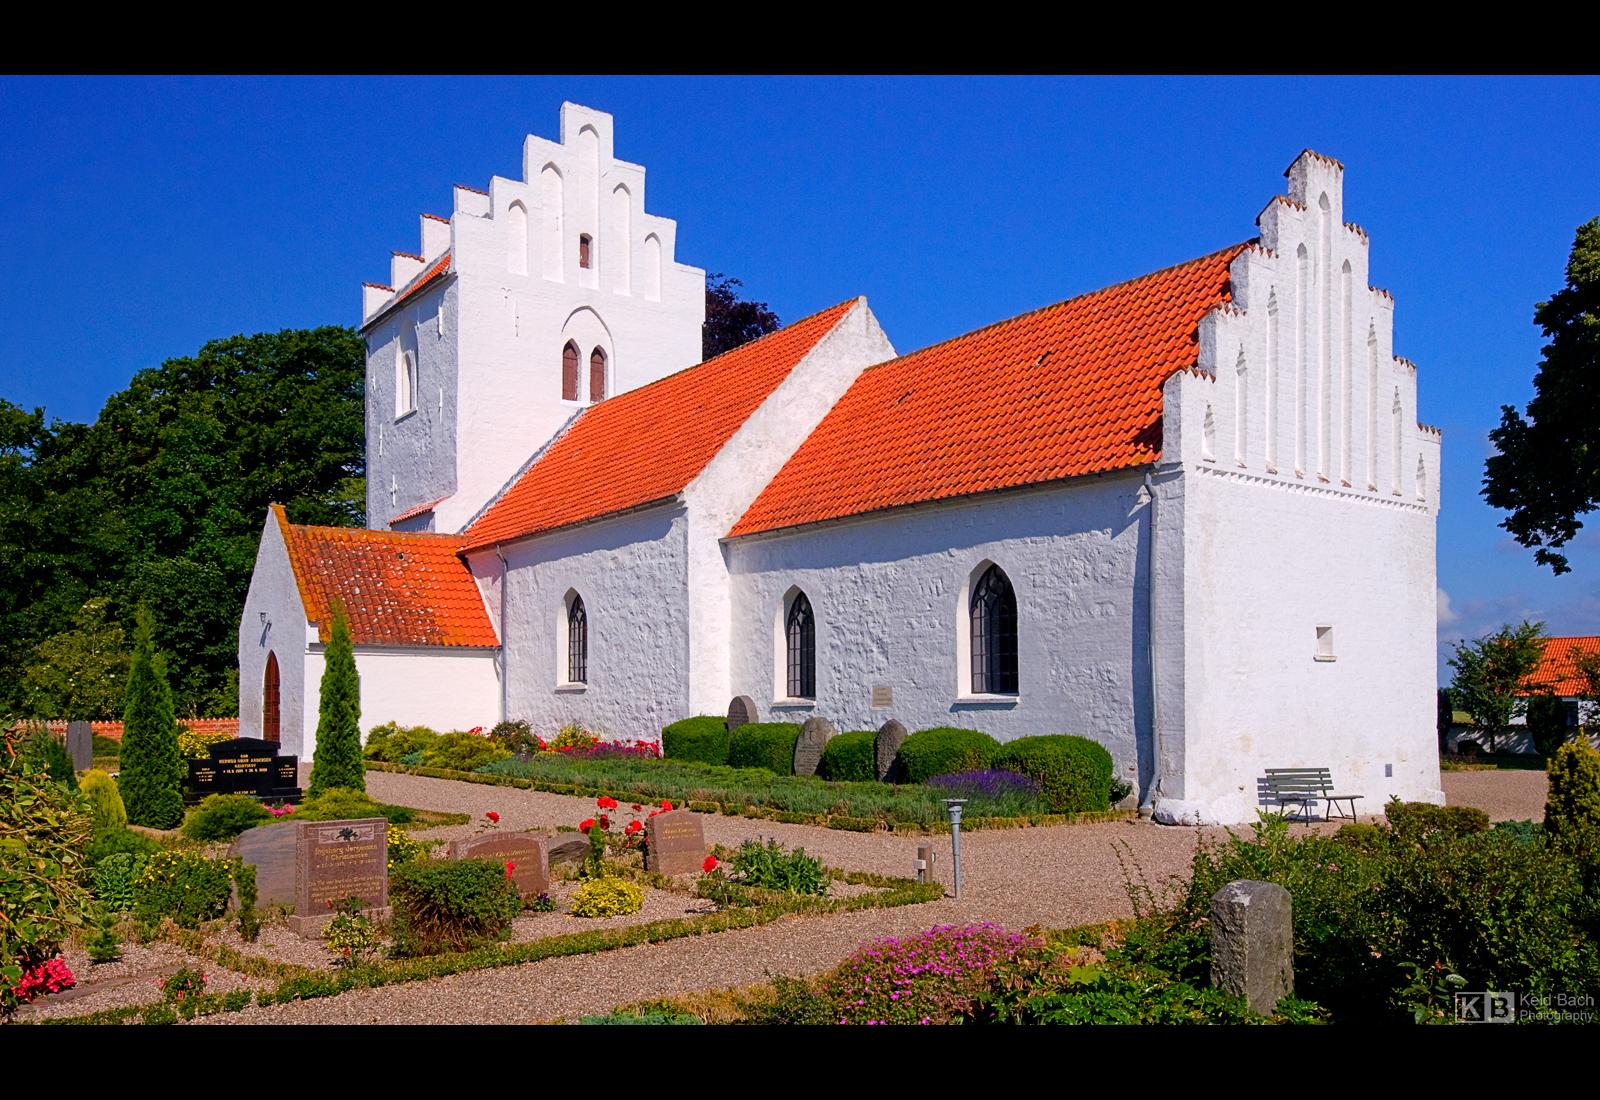 Sorterup Church by KeldBach